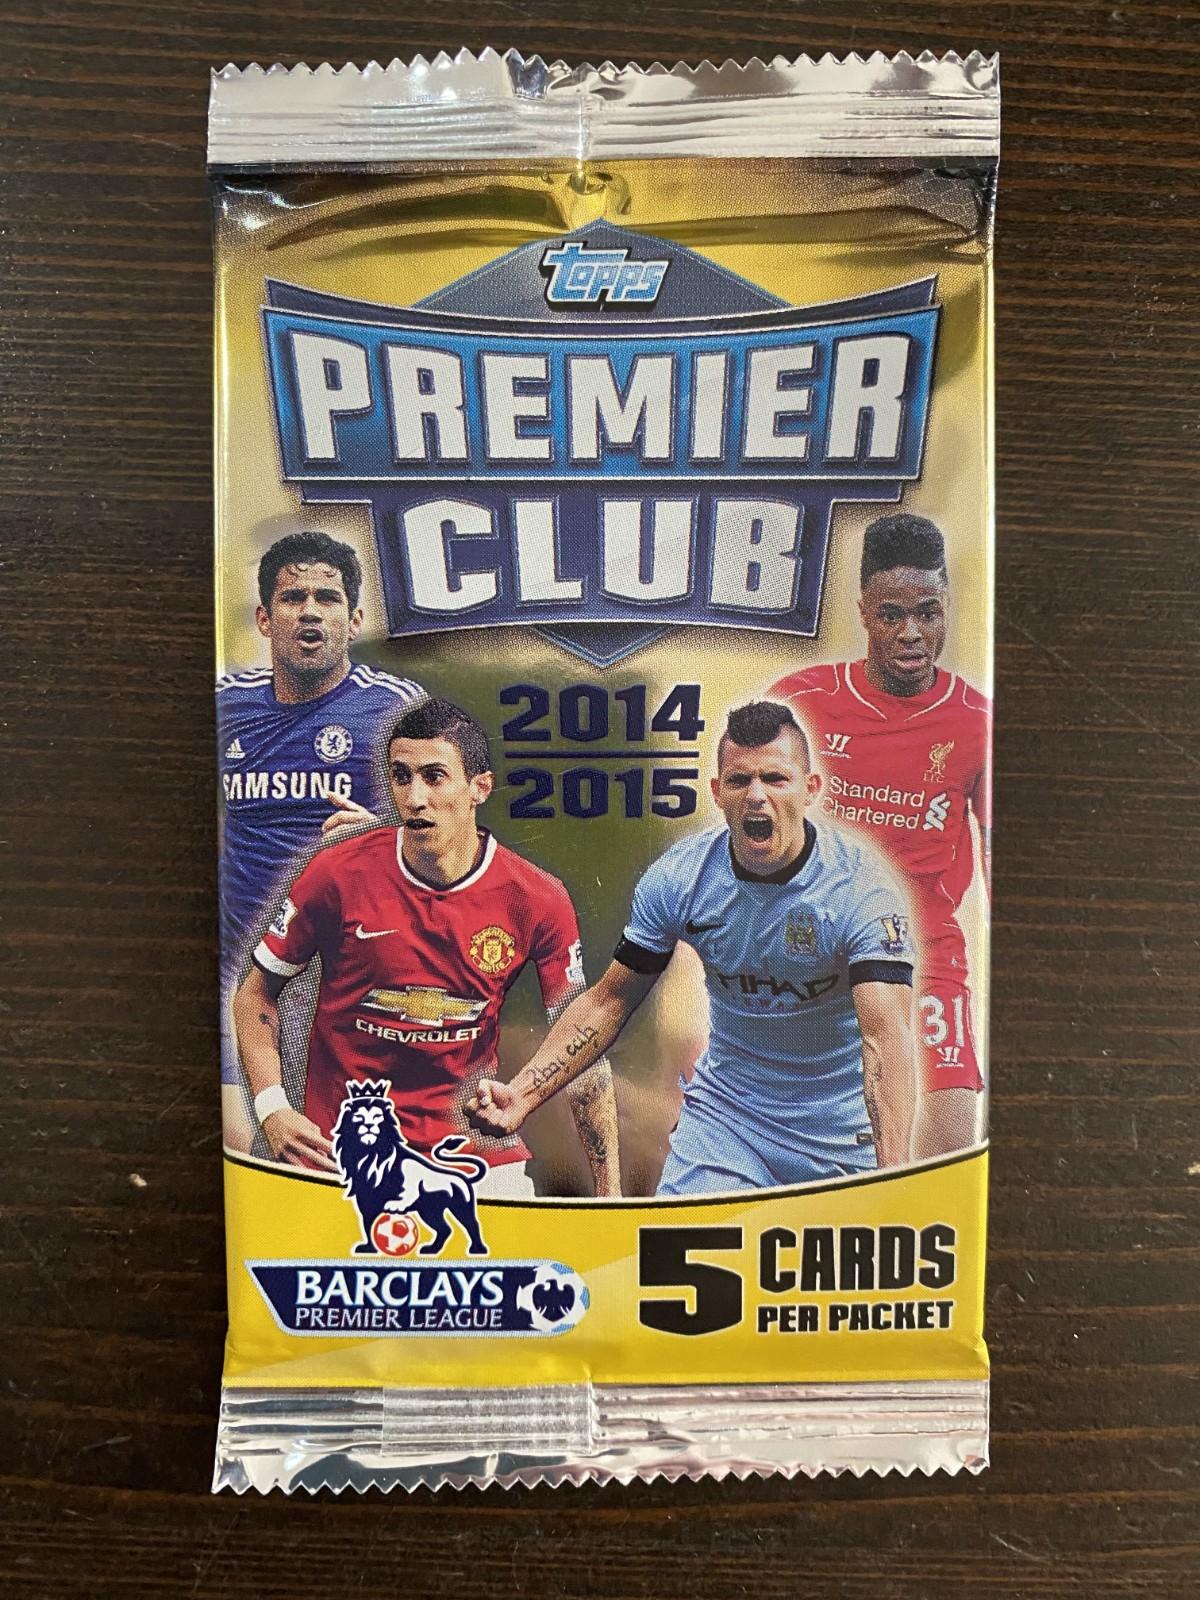 2014-15 topps 英超 premier club 球星卡单包卡包